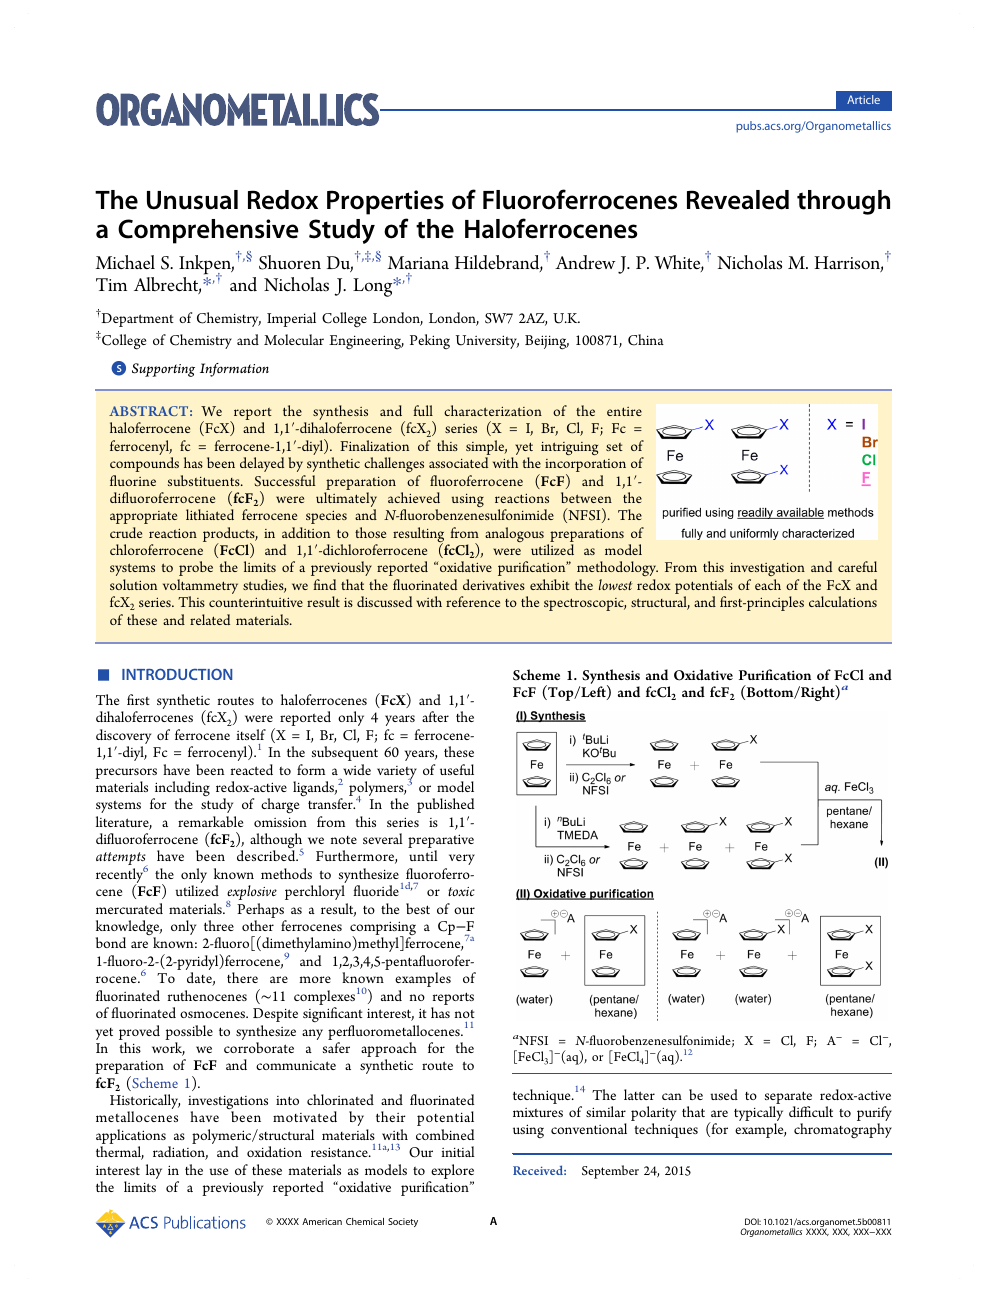 The Unusual Redox Properties of Fluoroferrocenes Revealed